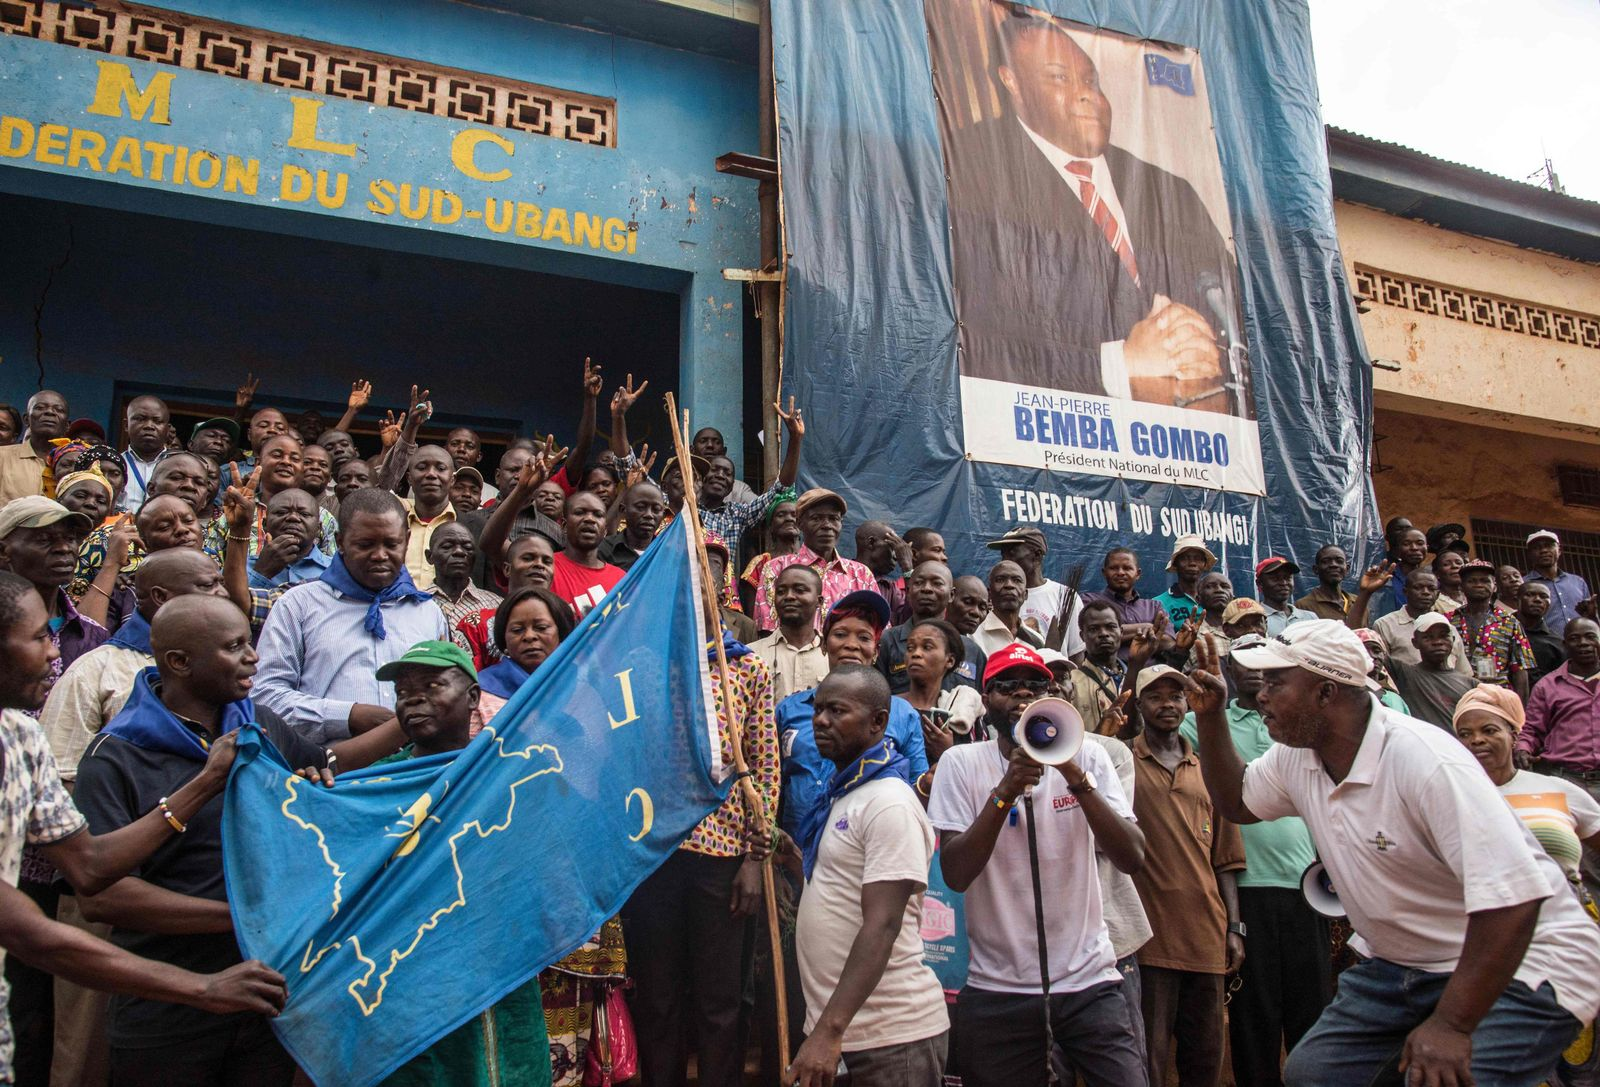 MLC Bemba Kongo